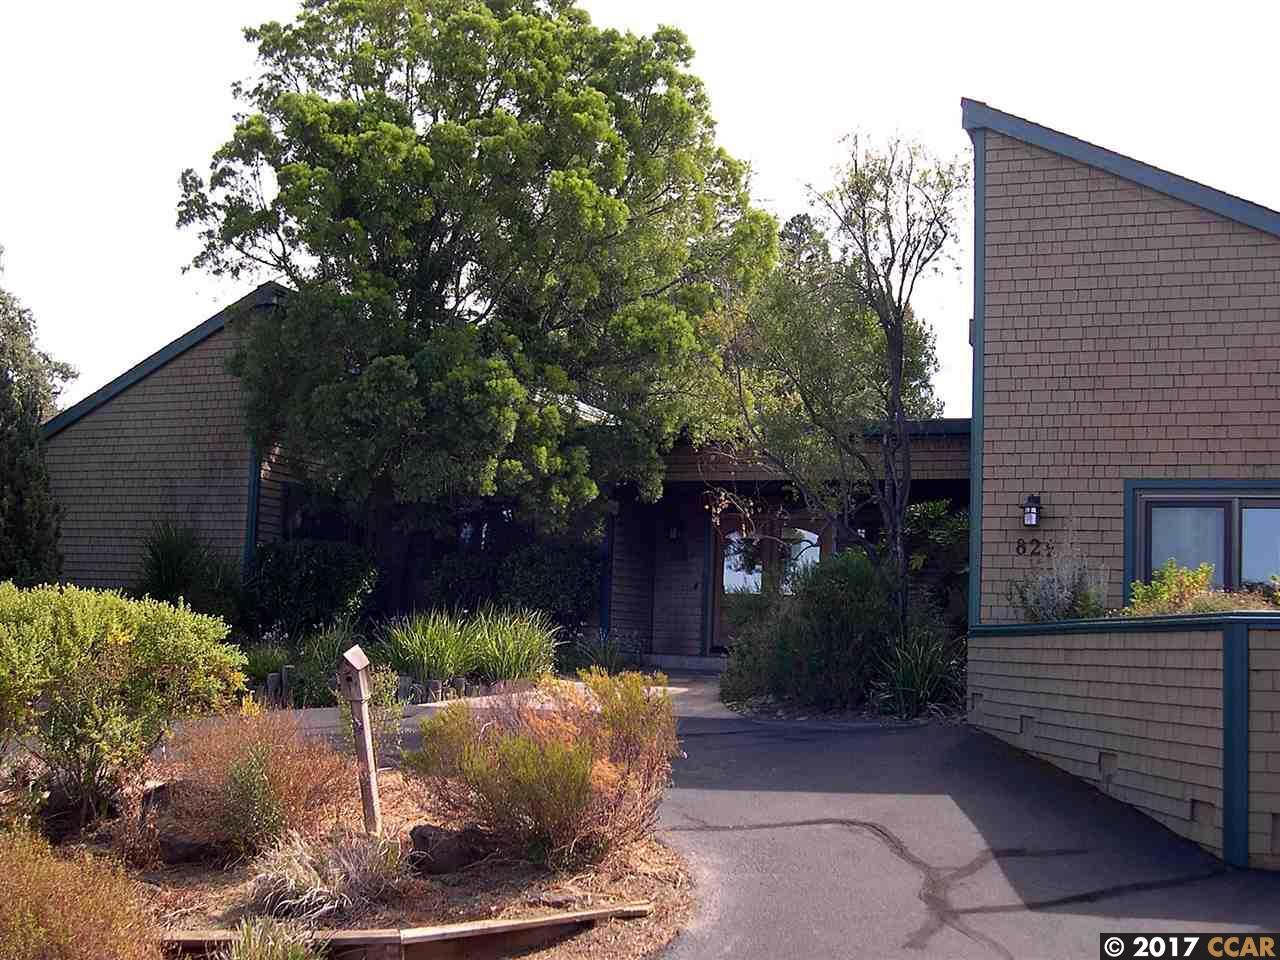 Casa Unifamiliar por un Venta en 824 Carter Acres Lane Martinez, California 94553 Estados Unidos